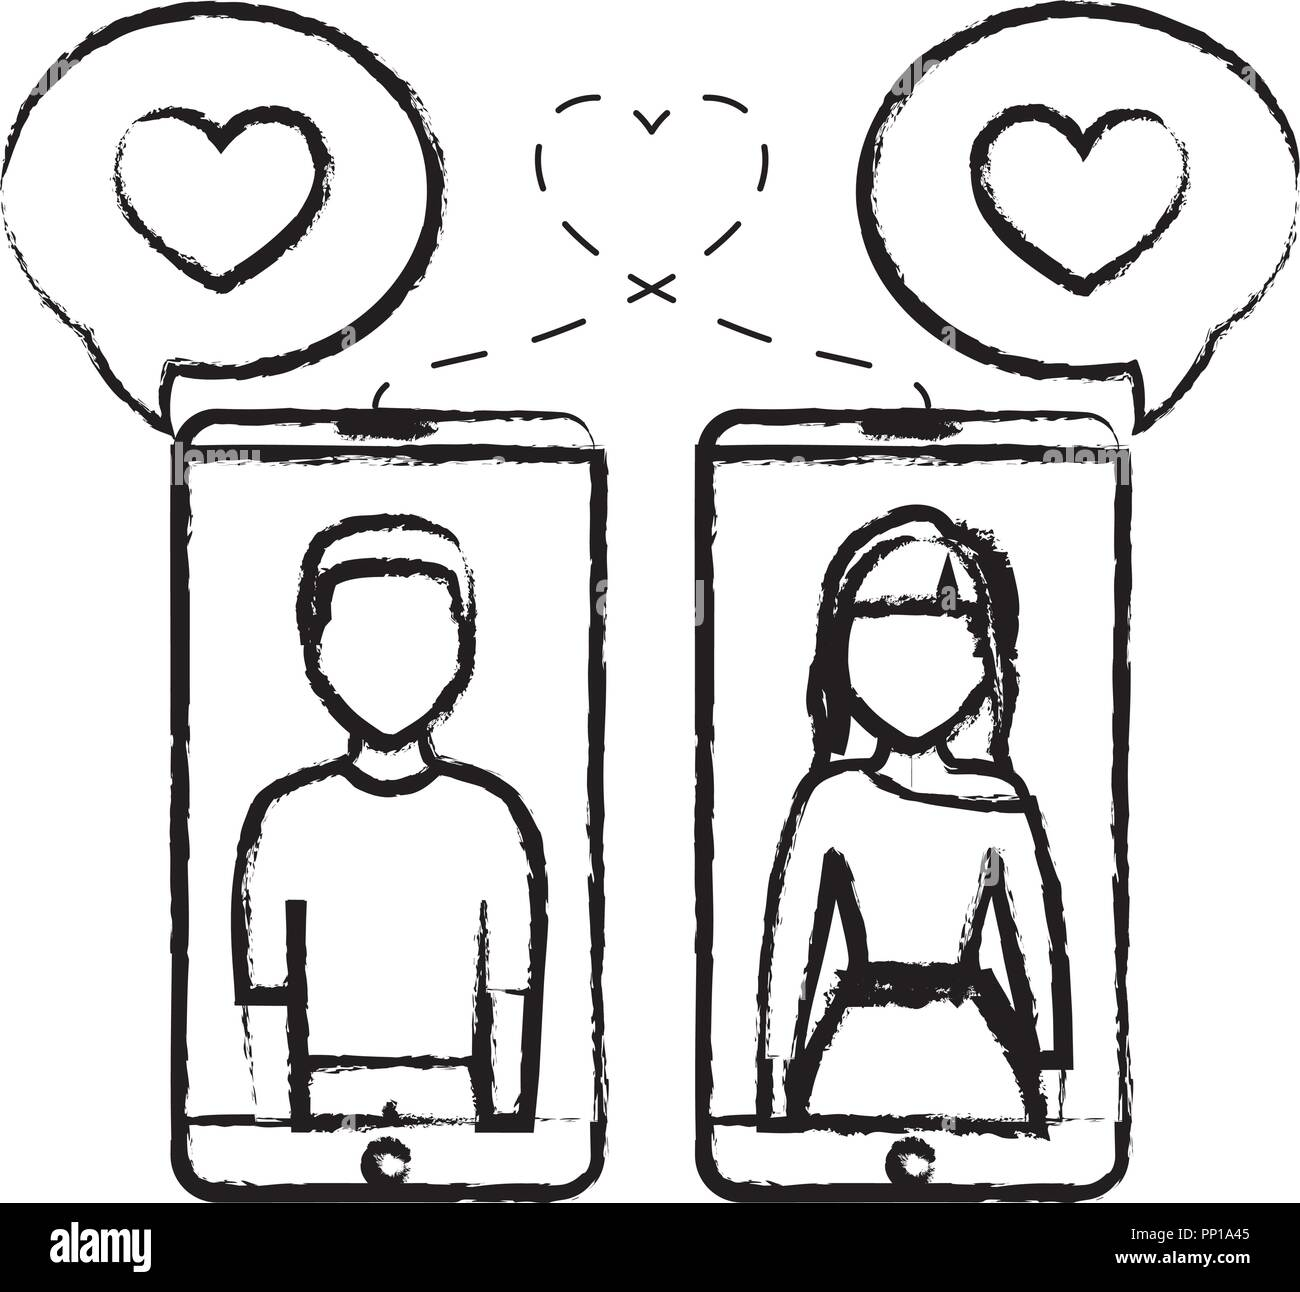 i kissed dating goodbye joshua harris epub download